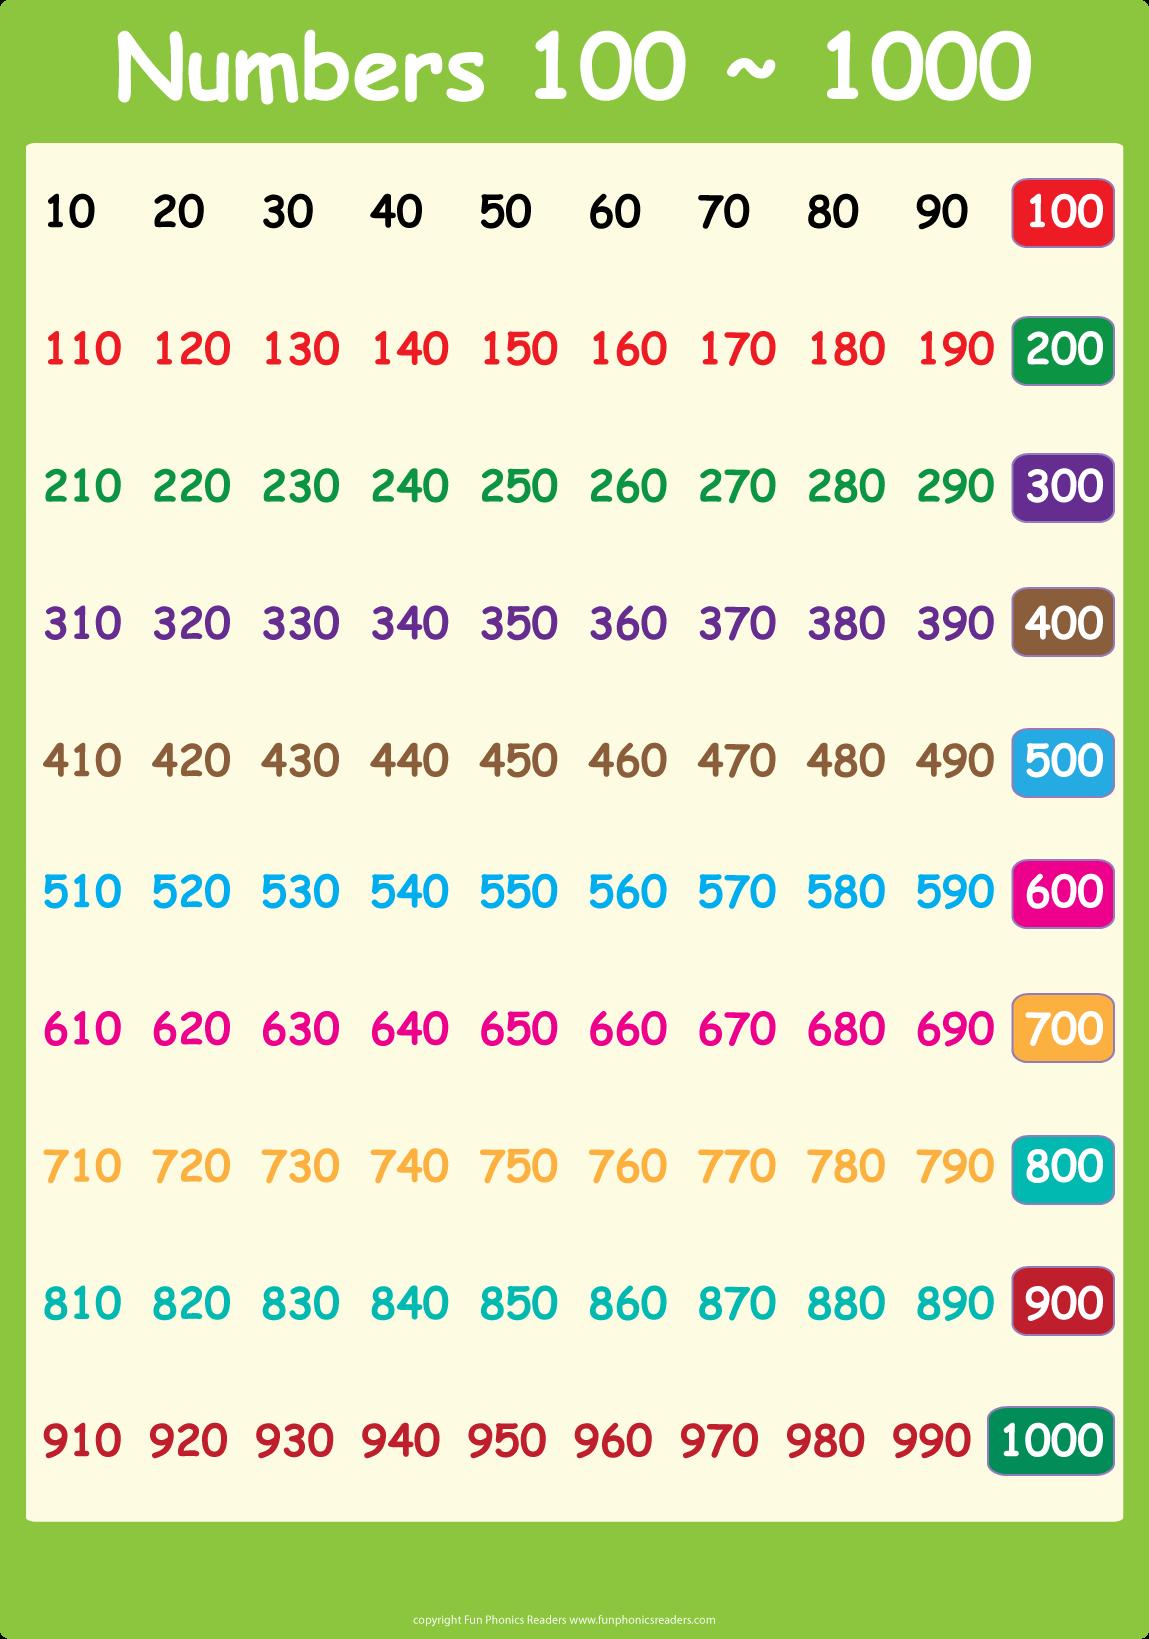 Pinnatalie On 1,2,3 Math | Number Chart, Teaching Math, School - Free Printable Number Chart To 1000